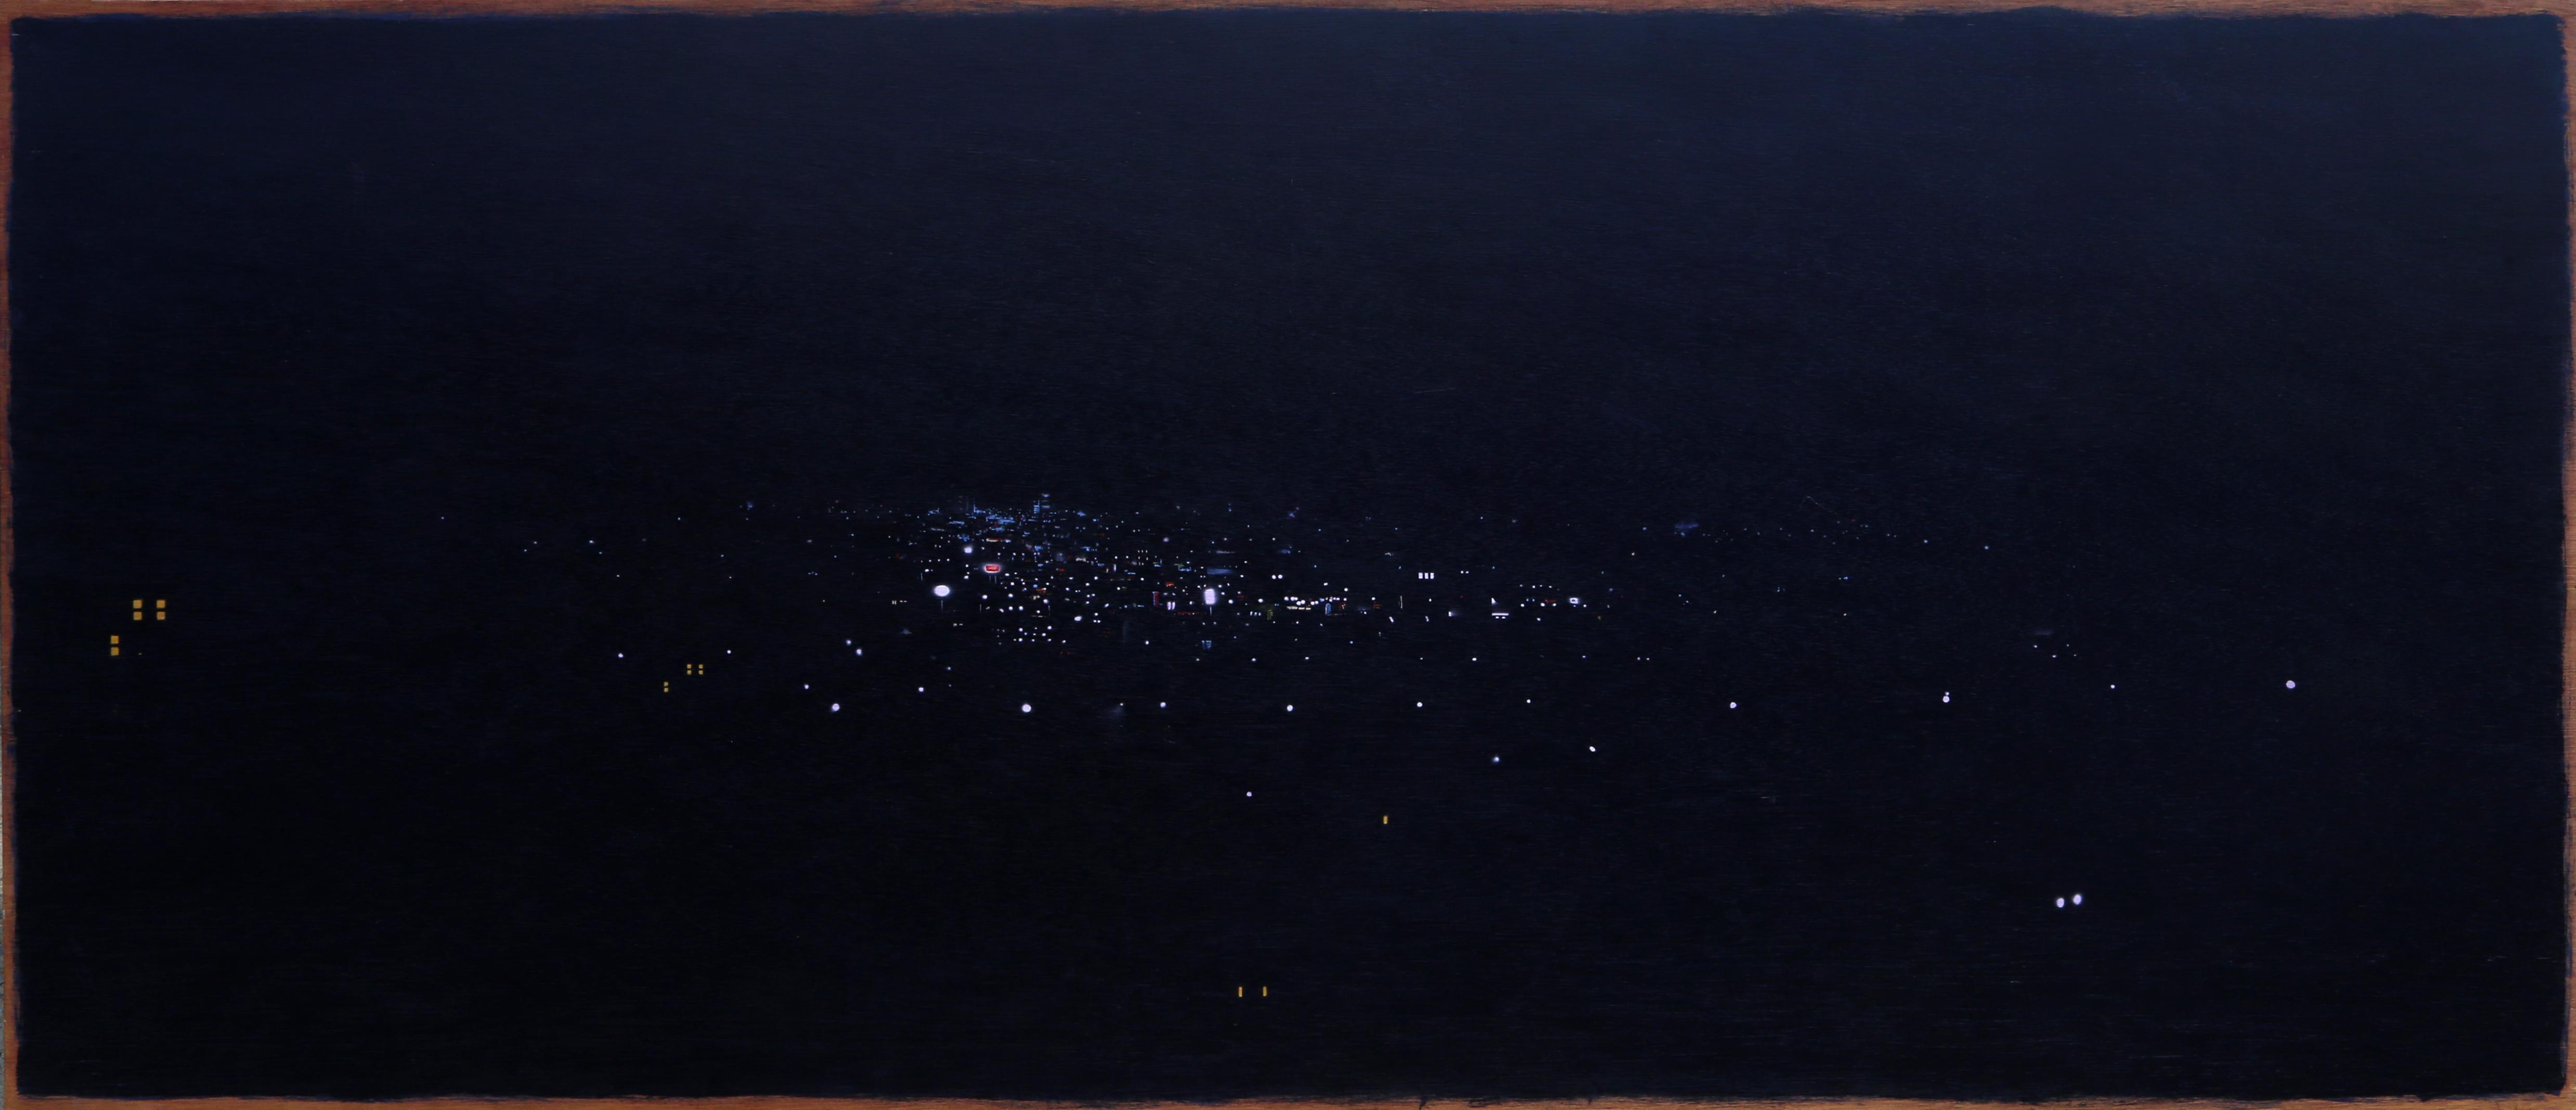 Babylon, Large City at Night Painting by John Bowman